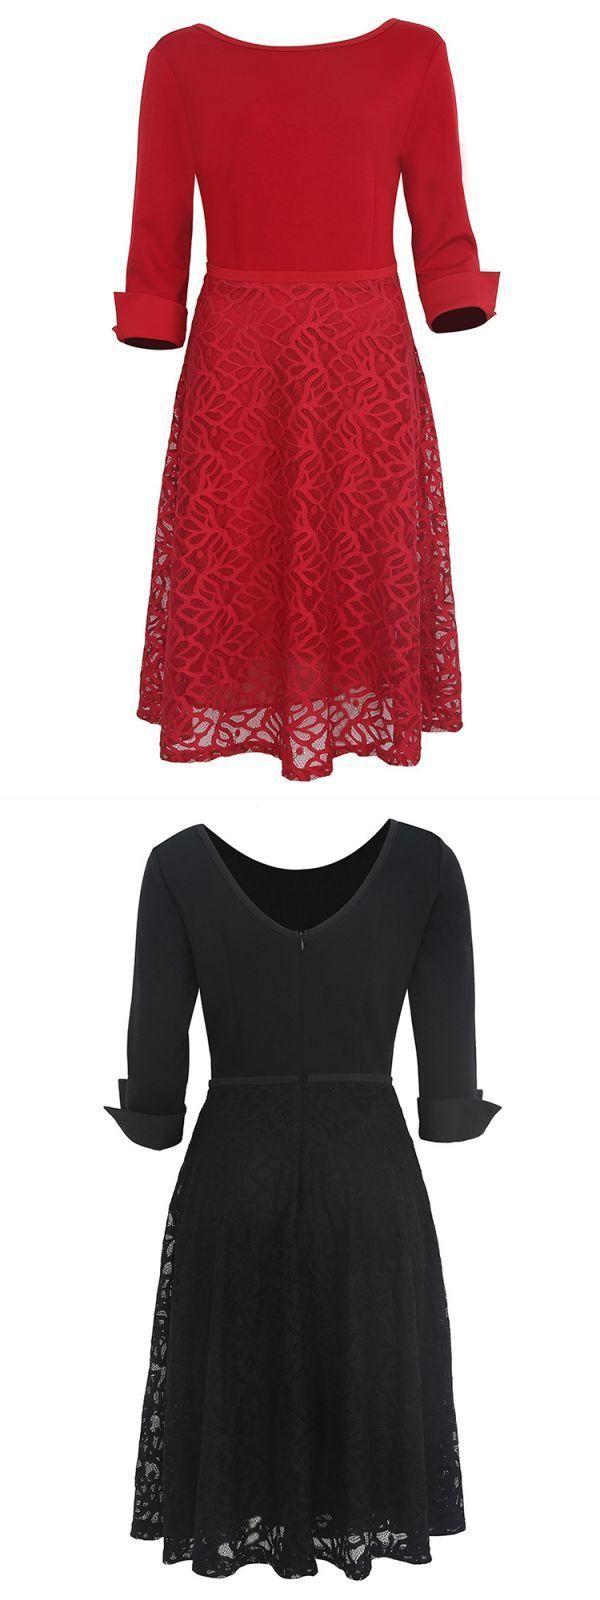 Elegant women slim backless sleeve lace patchwork party dresses